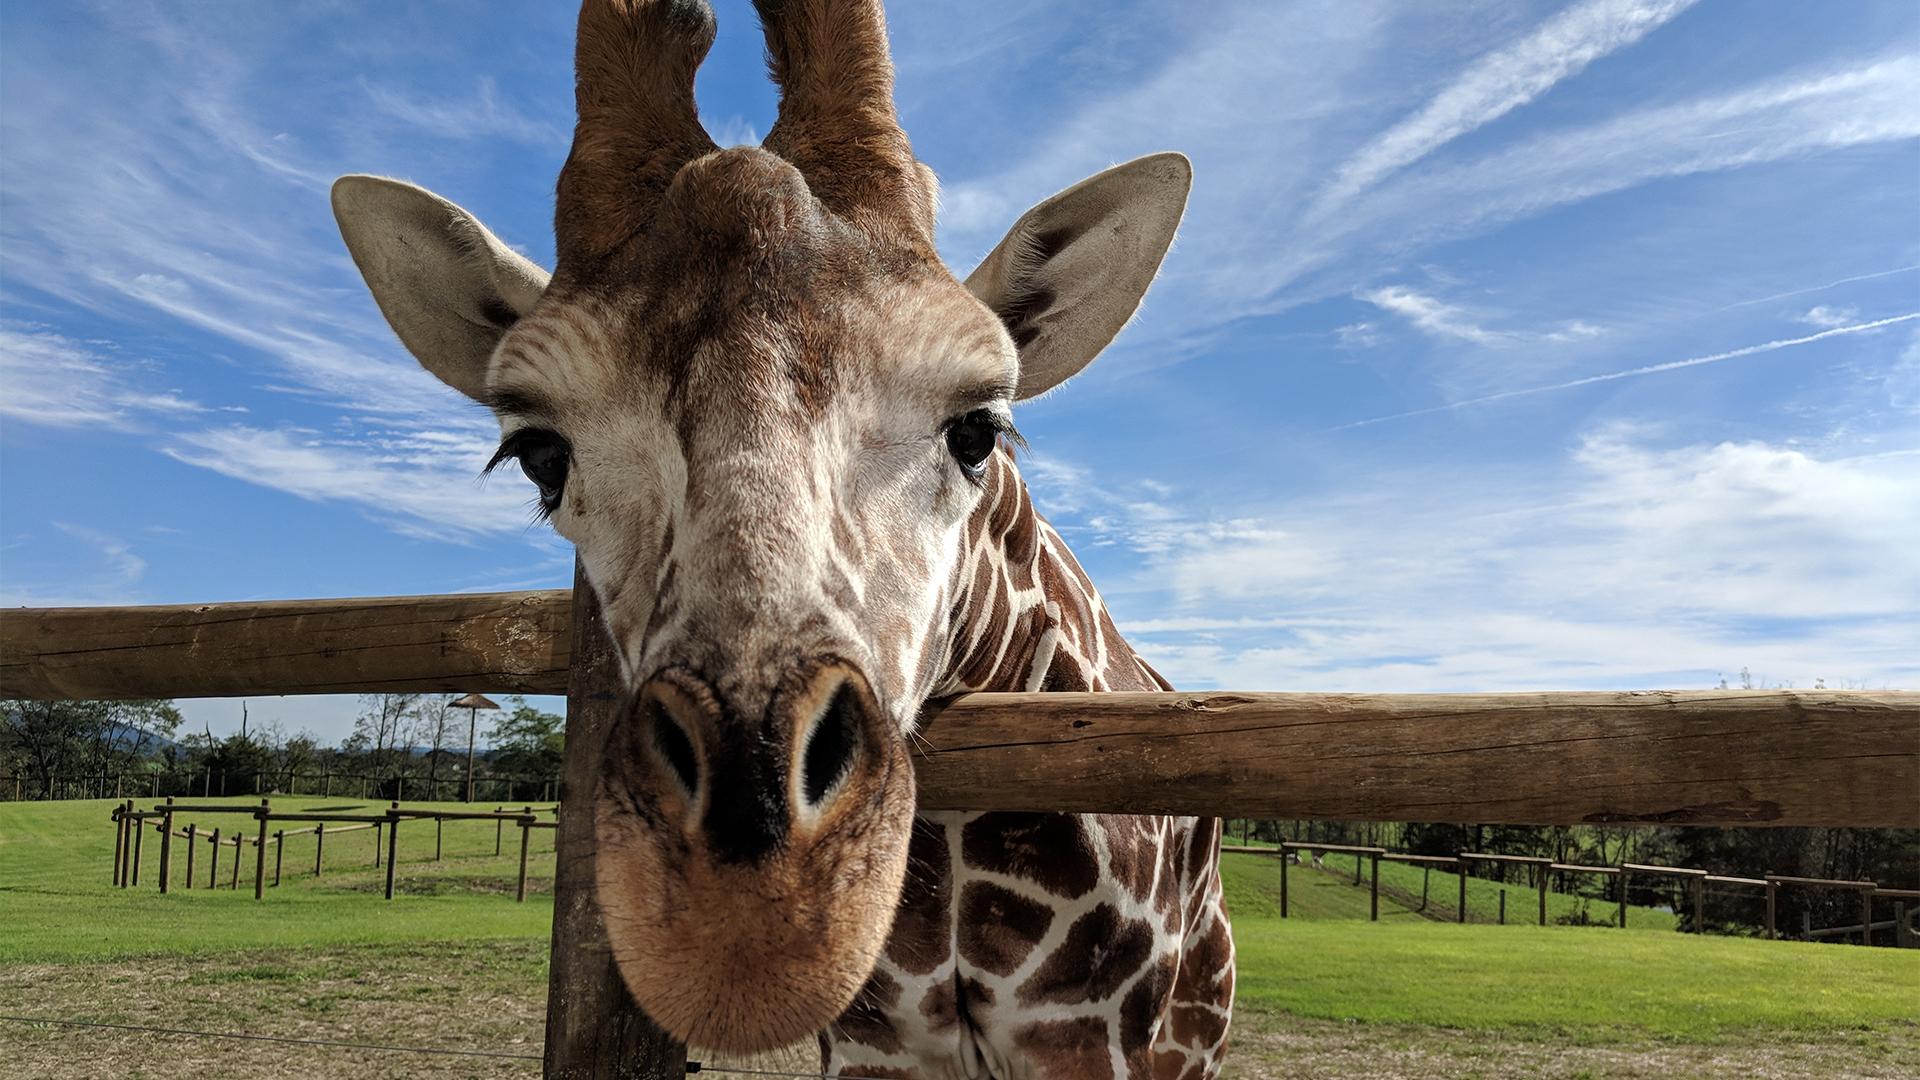 Giraffe at Lake Tobias Wildlife Park